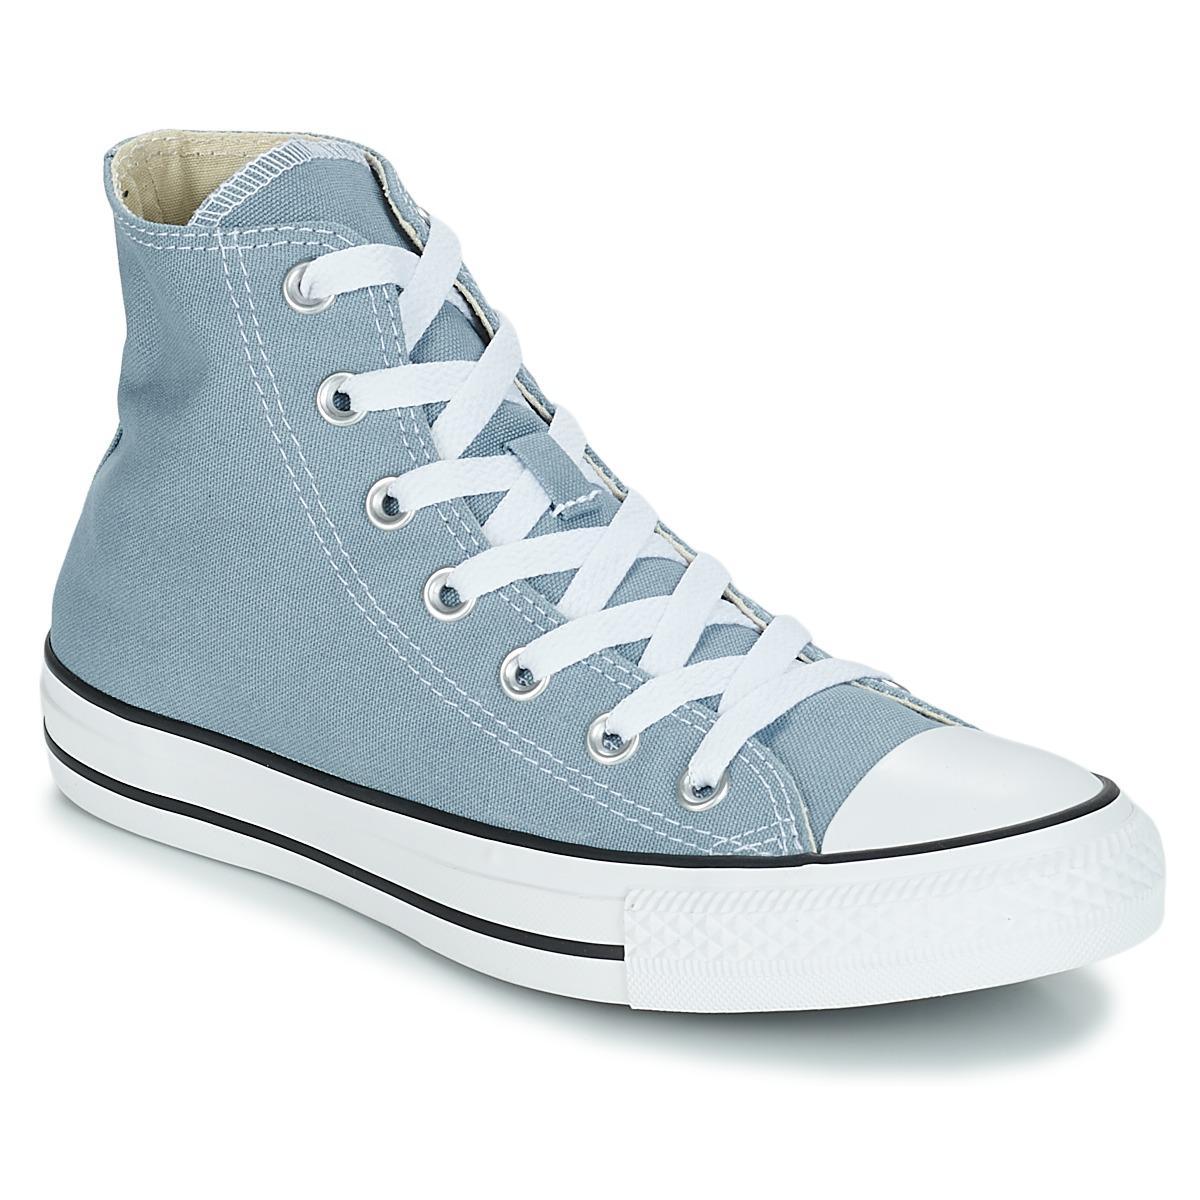 f85bbb6ec38b Converse Chuck Taylor All Star Hi Women s Shoes (high-top Trainers ...